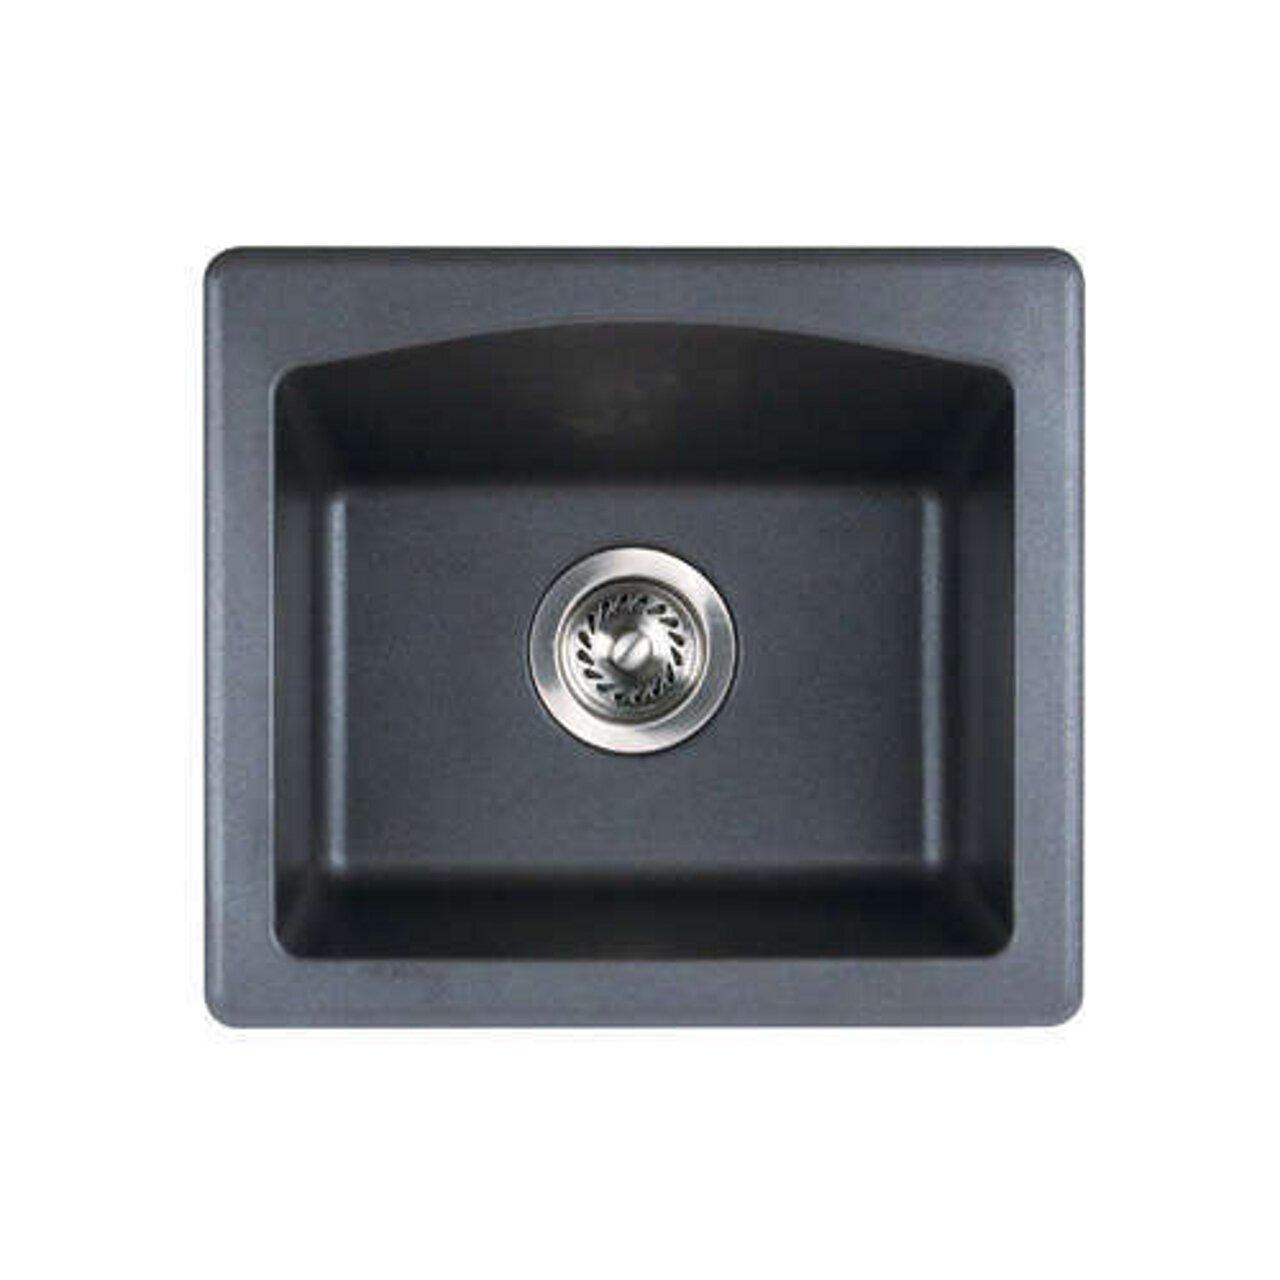 Swanstone QZ01816BS.077 Granite Dual Mount Single-Bowl Kitchen Sink, 16'' L x 18'' H x 7.5'' H, Nero